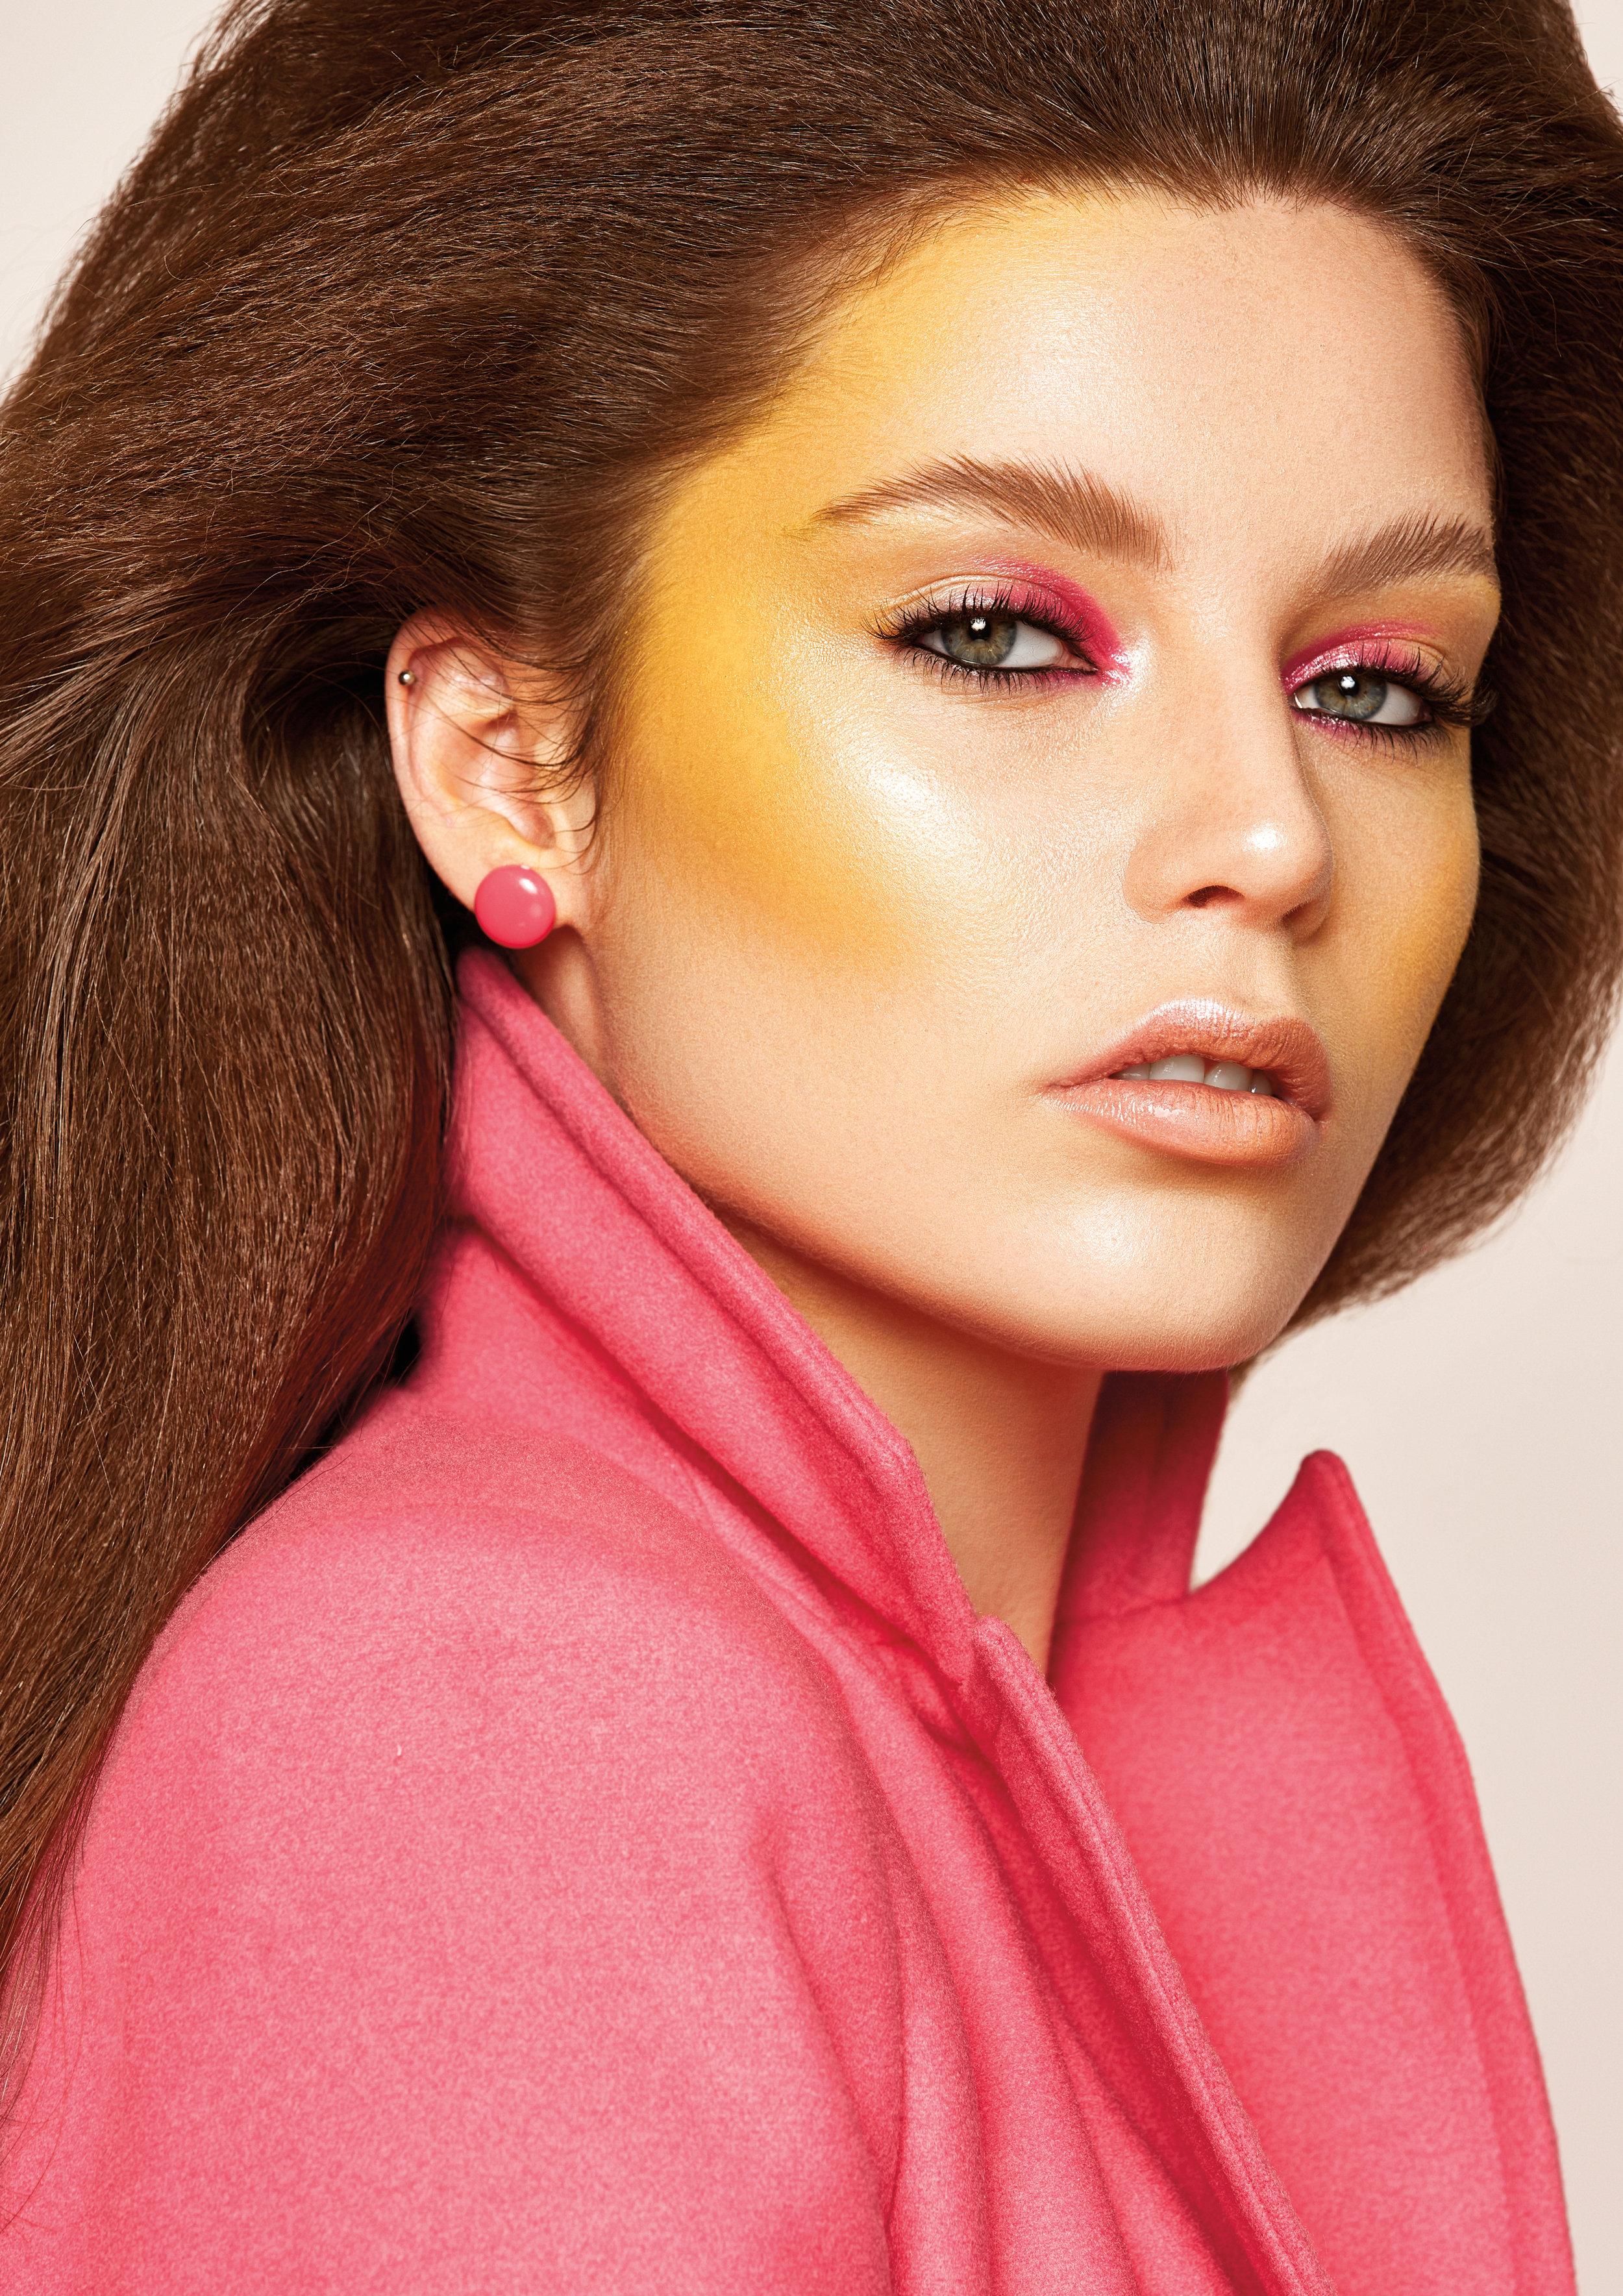 Makeup Artist - Krista Jade